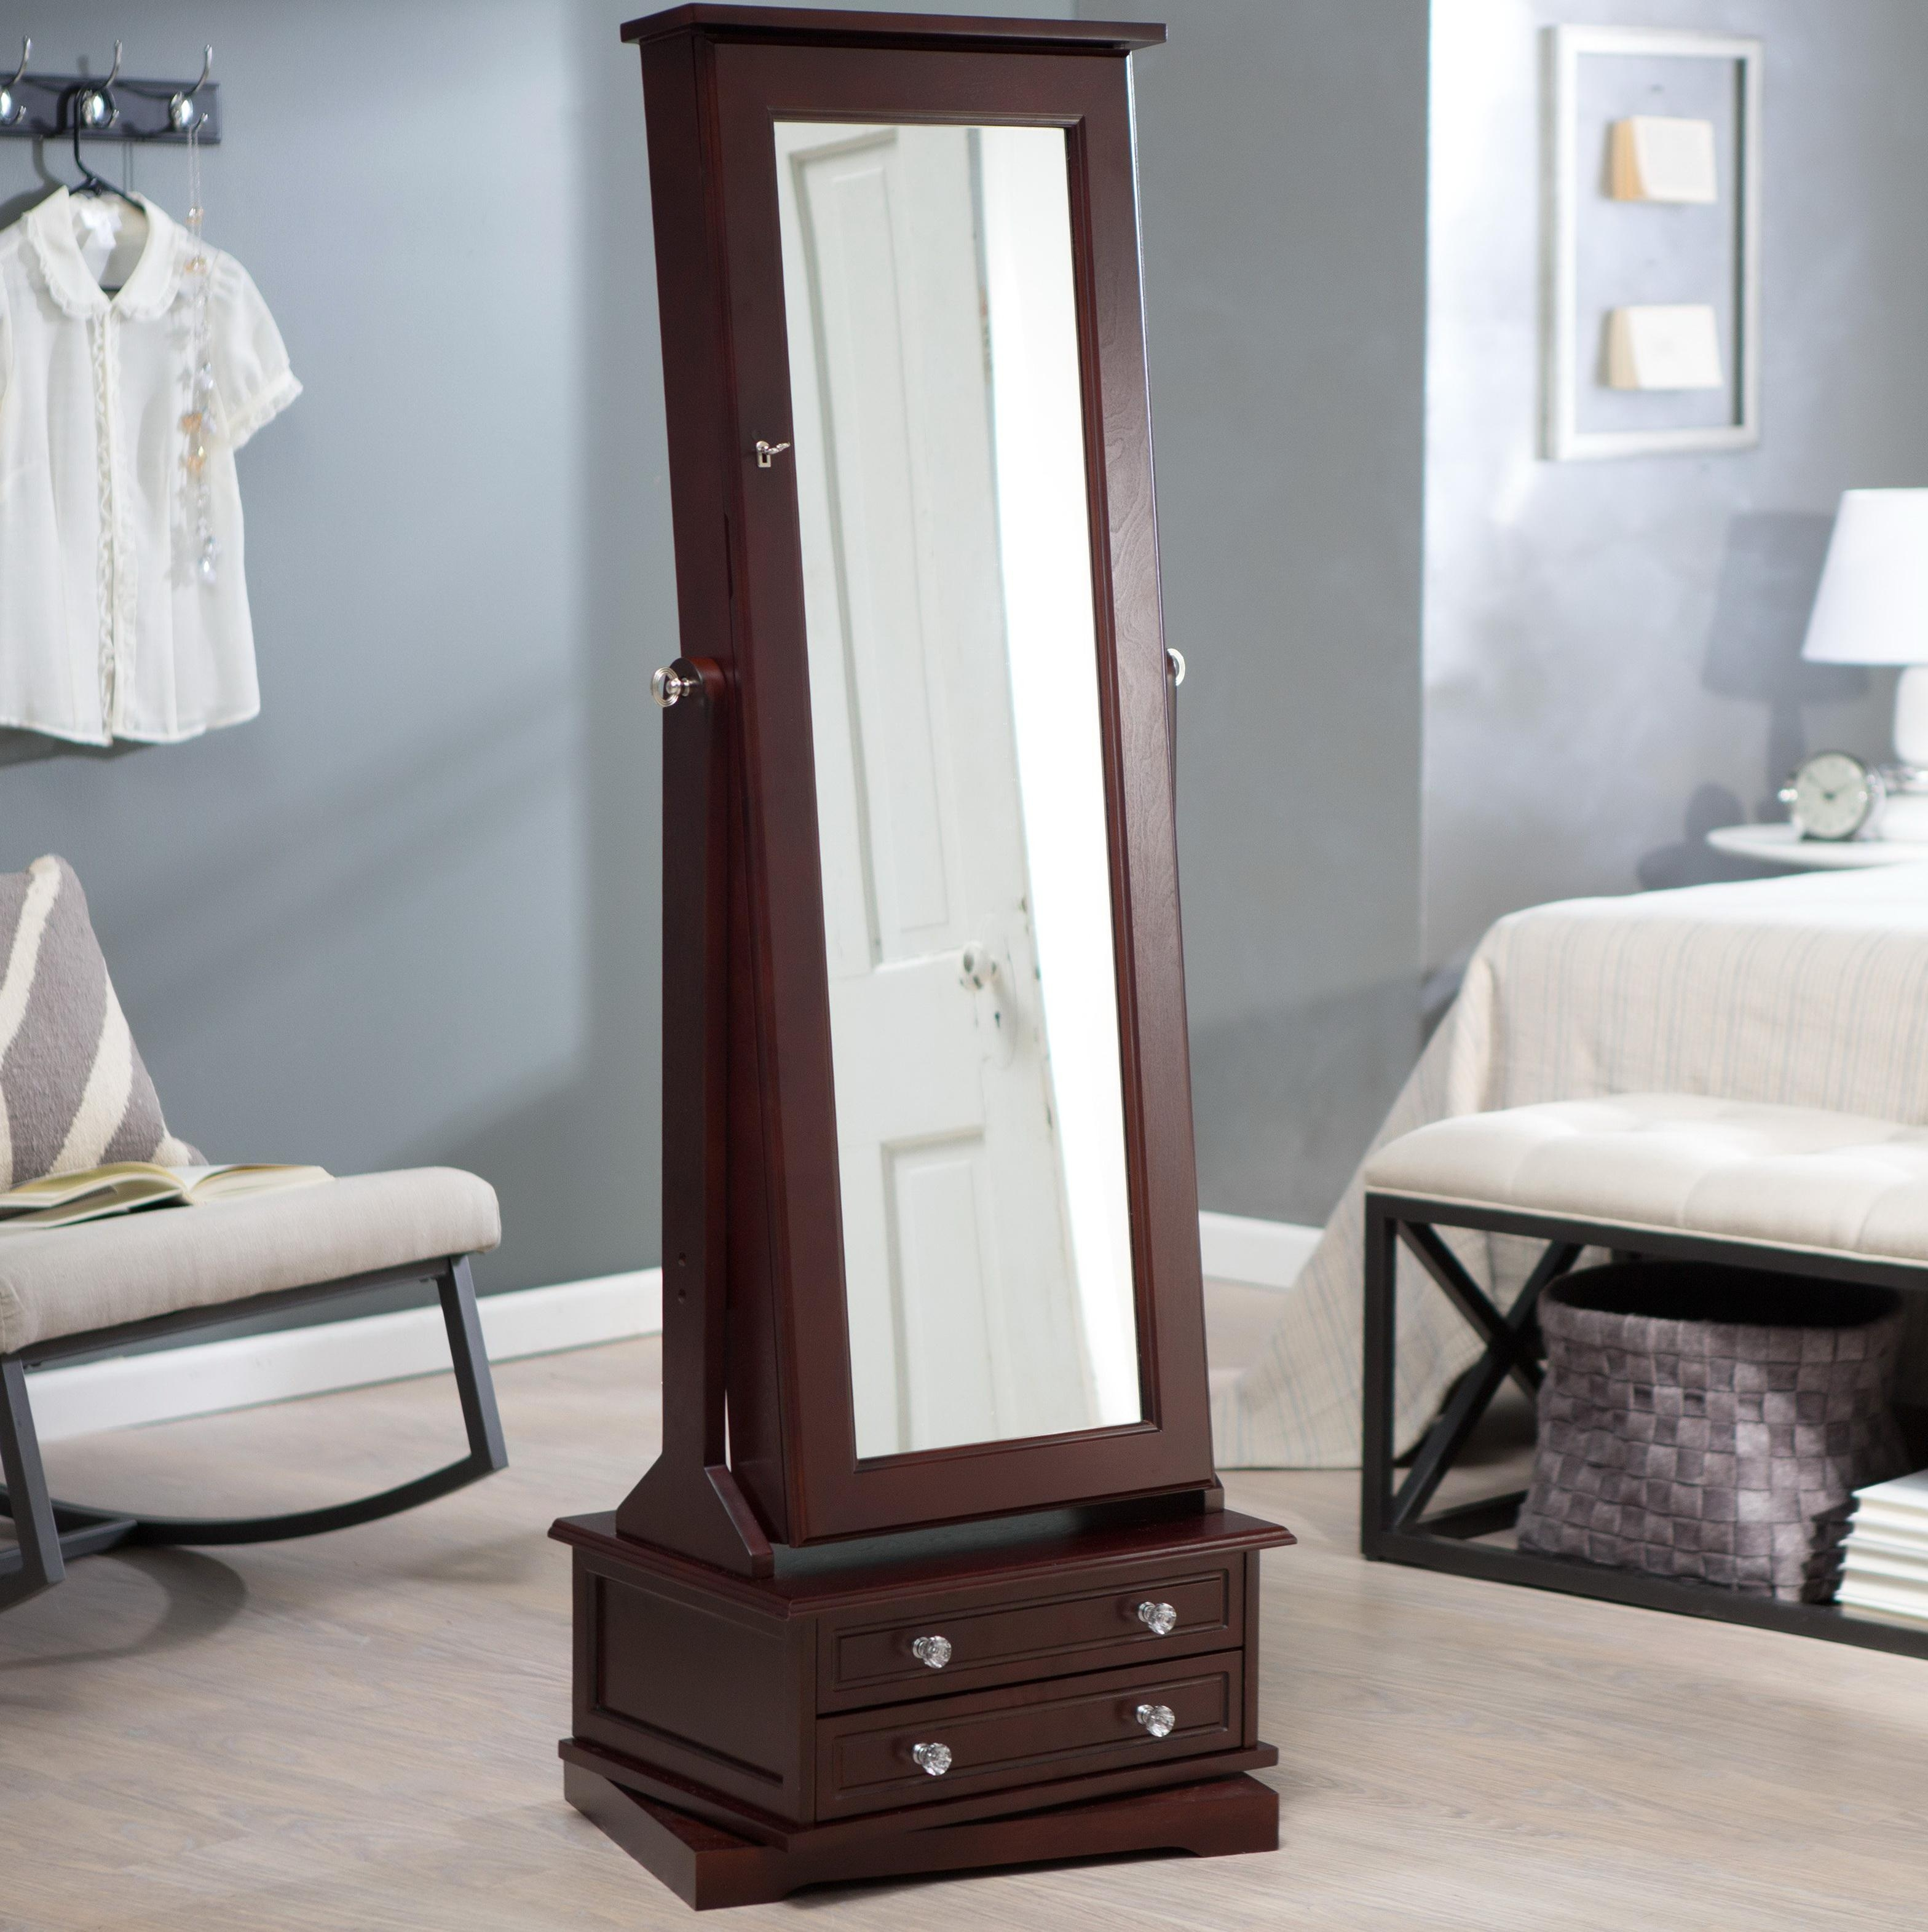 20 Collection Of Floor Dressing Mirror Mirror Ideas